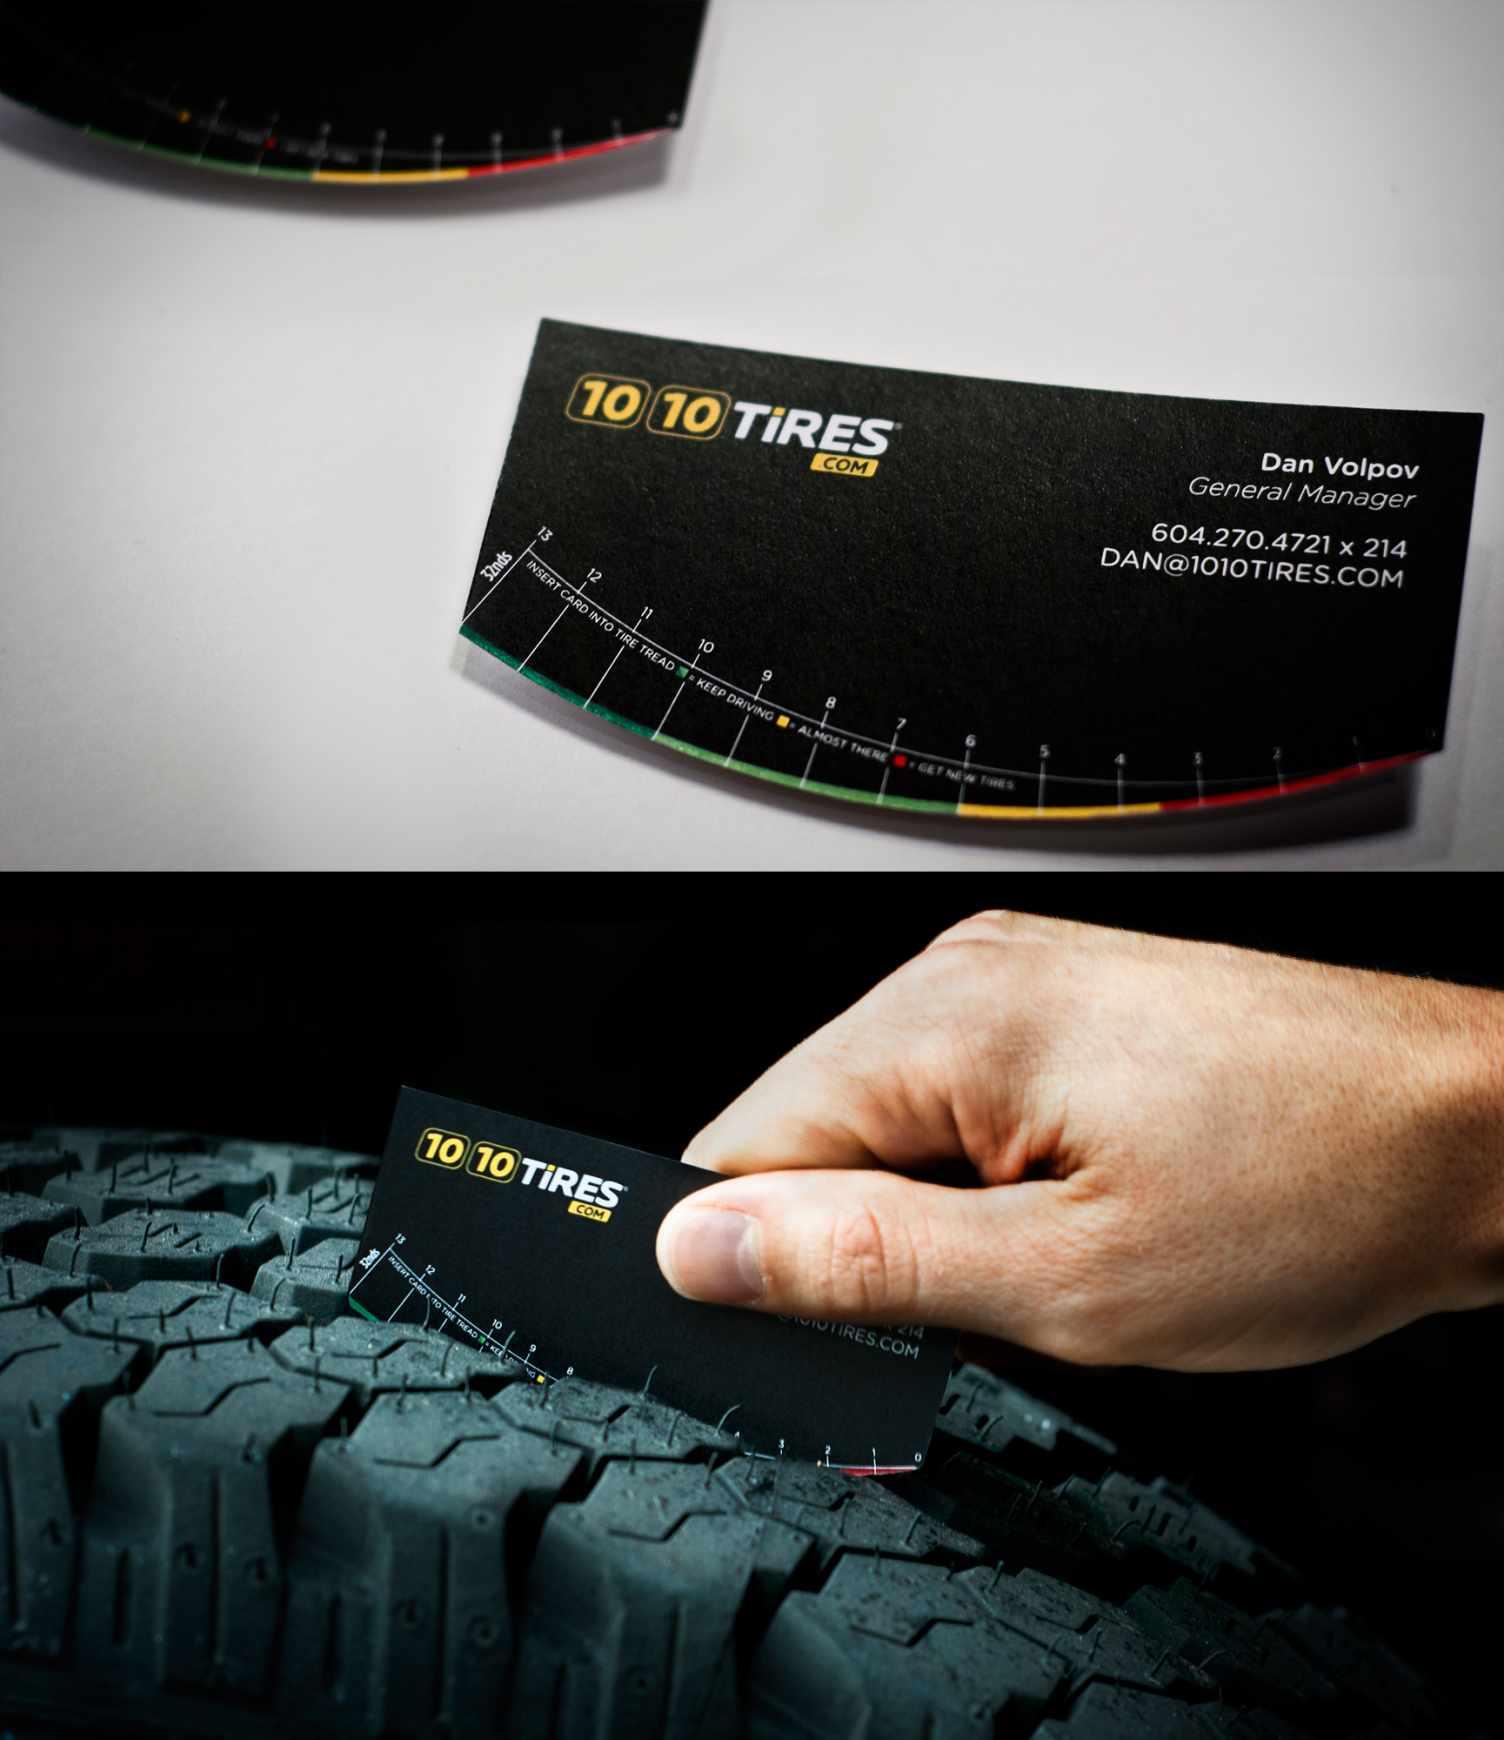 Tire tread business card